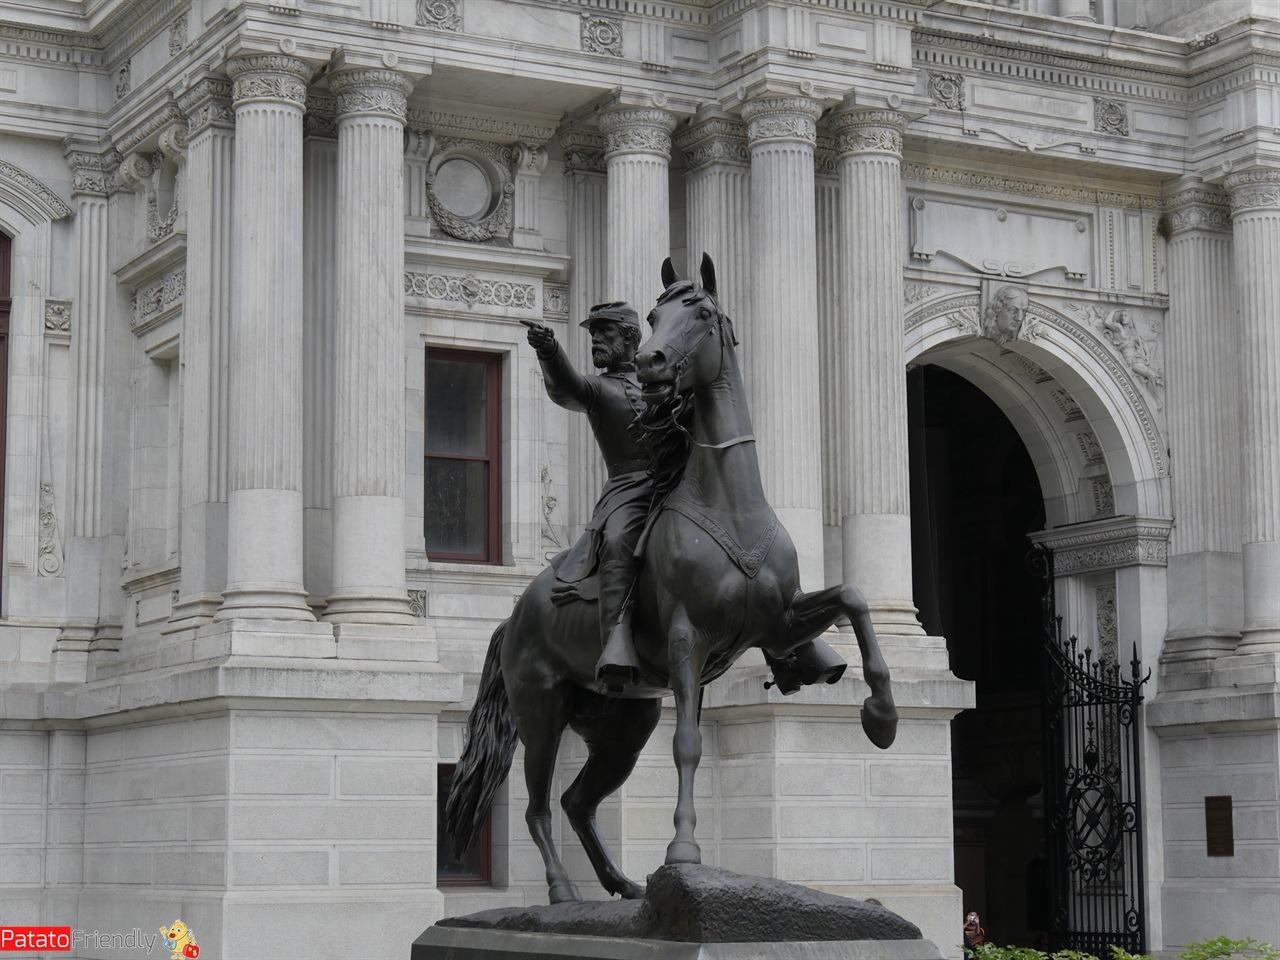 [cml_media_alt id='11624']Philadelphia - La statua del Generale Reynolds[/cml_media_alt]